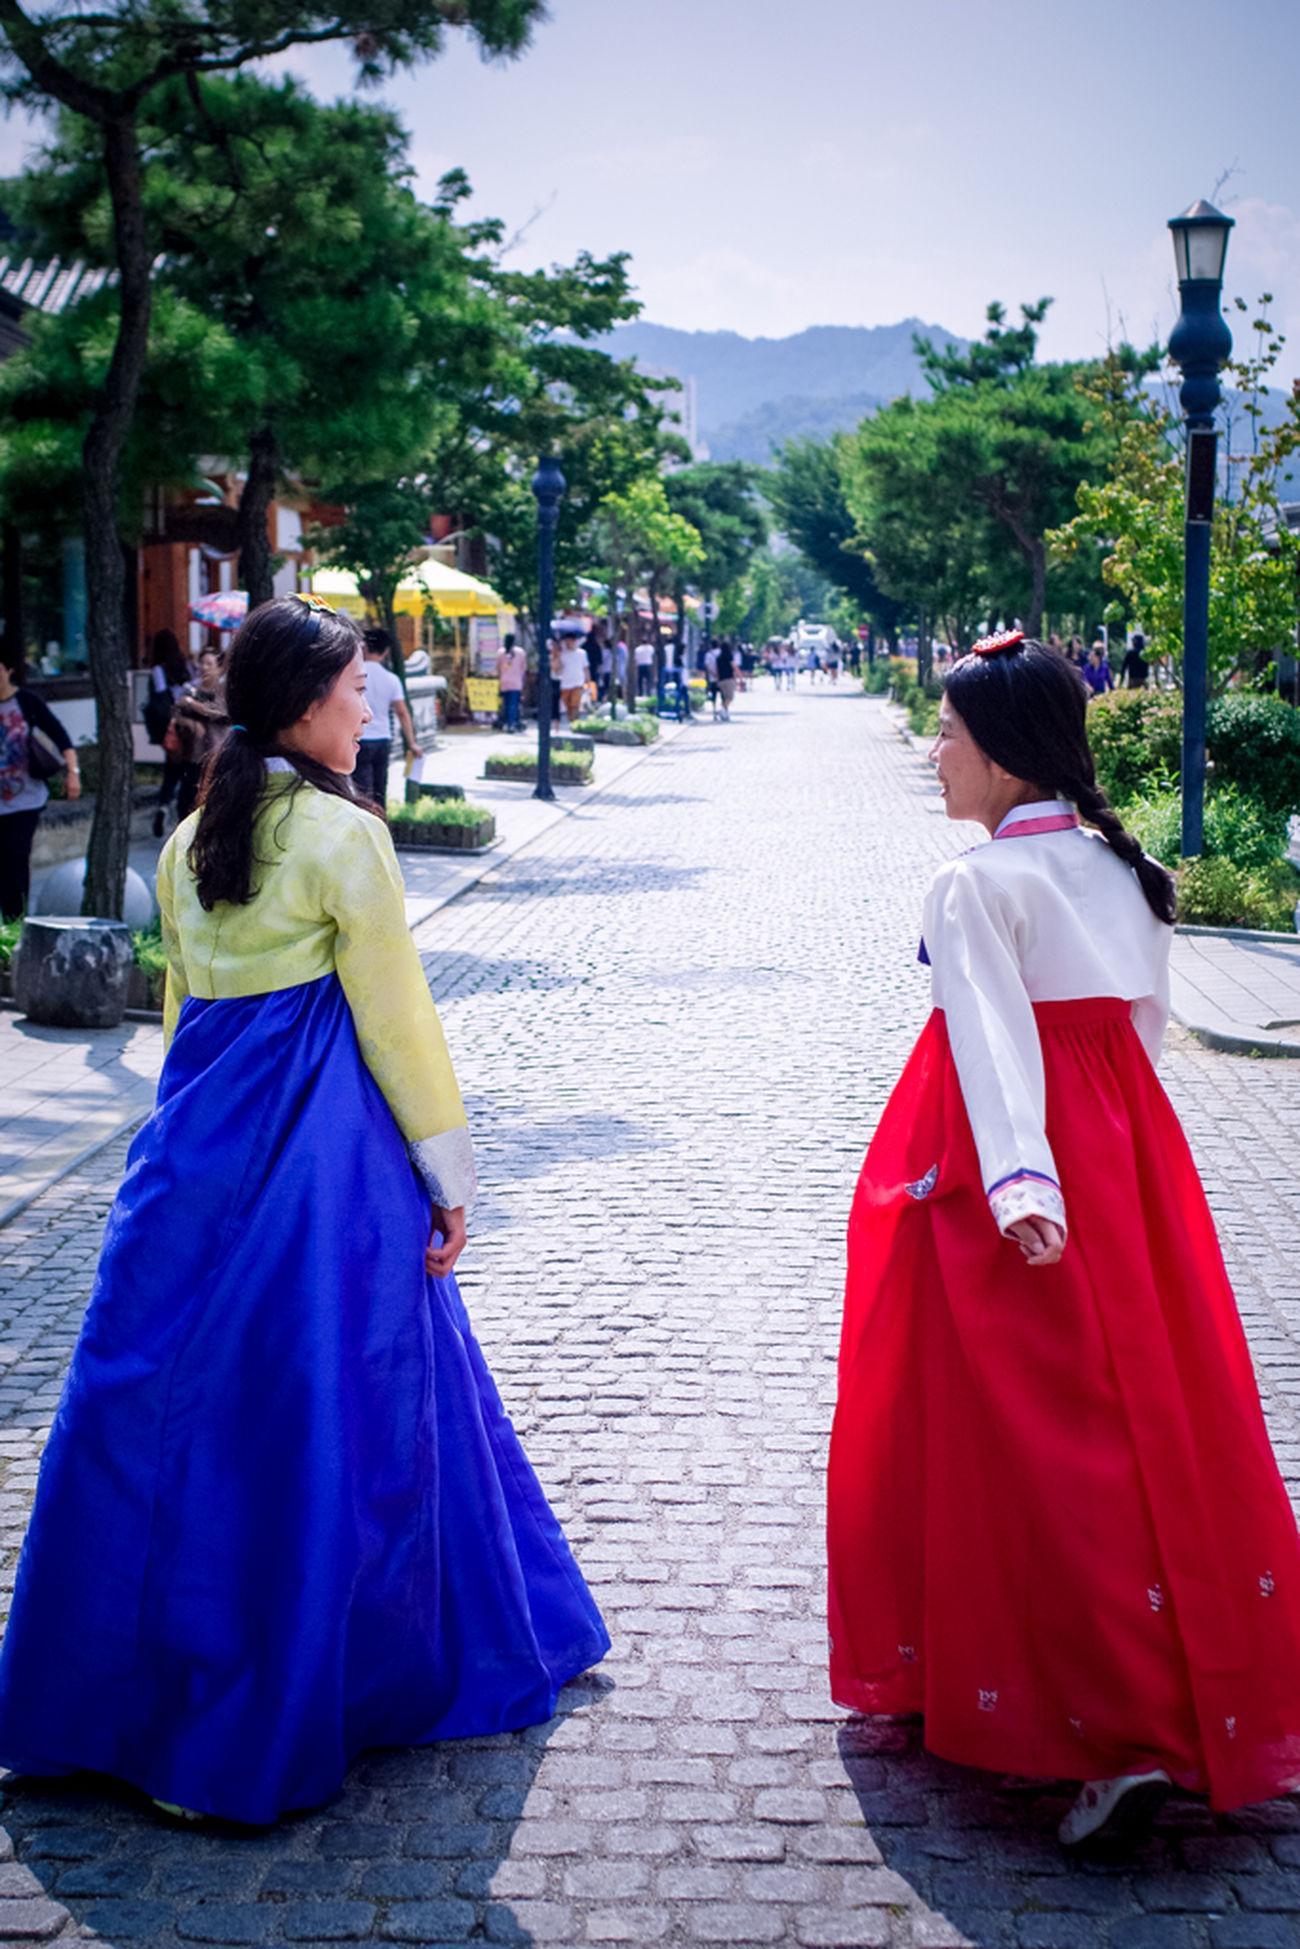 Korea Traditional Village Korea Tradition Korea Traditional Dress Portrait Streetphotography 전주한옥마을 한복 한옥마을